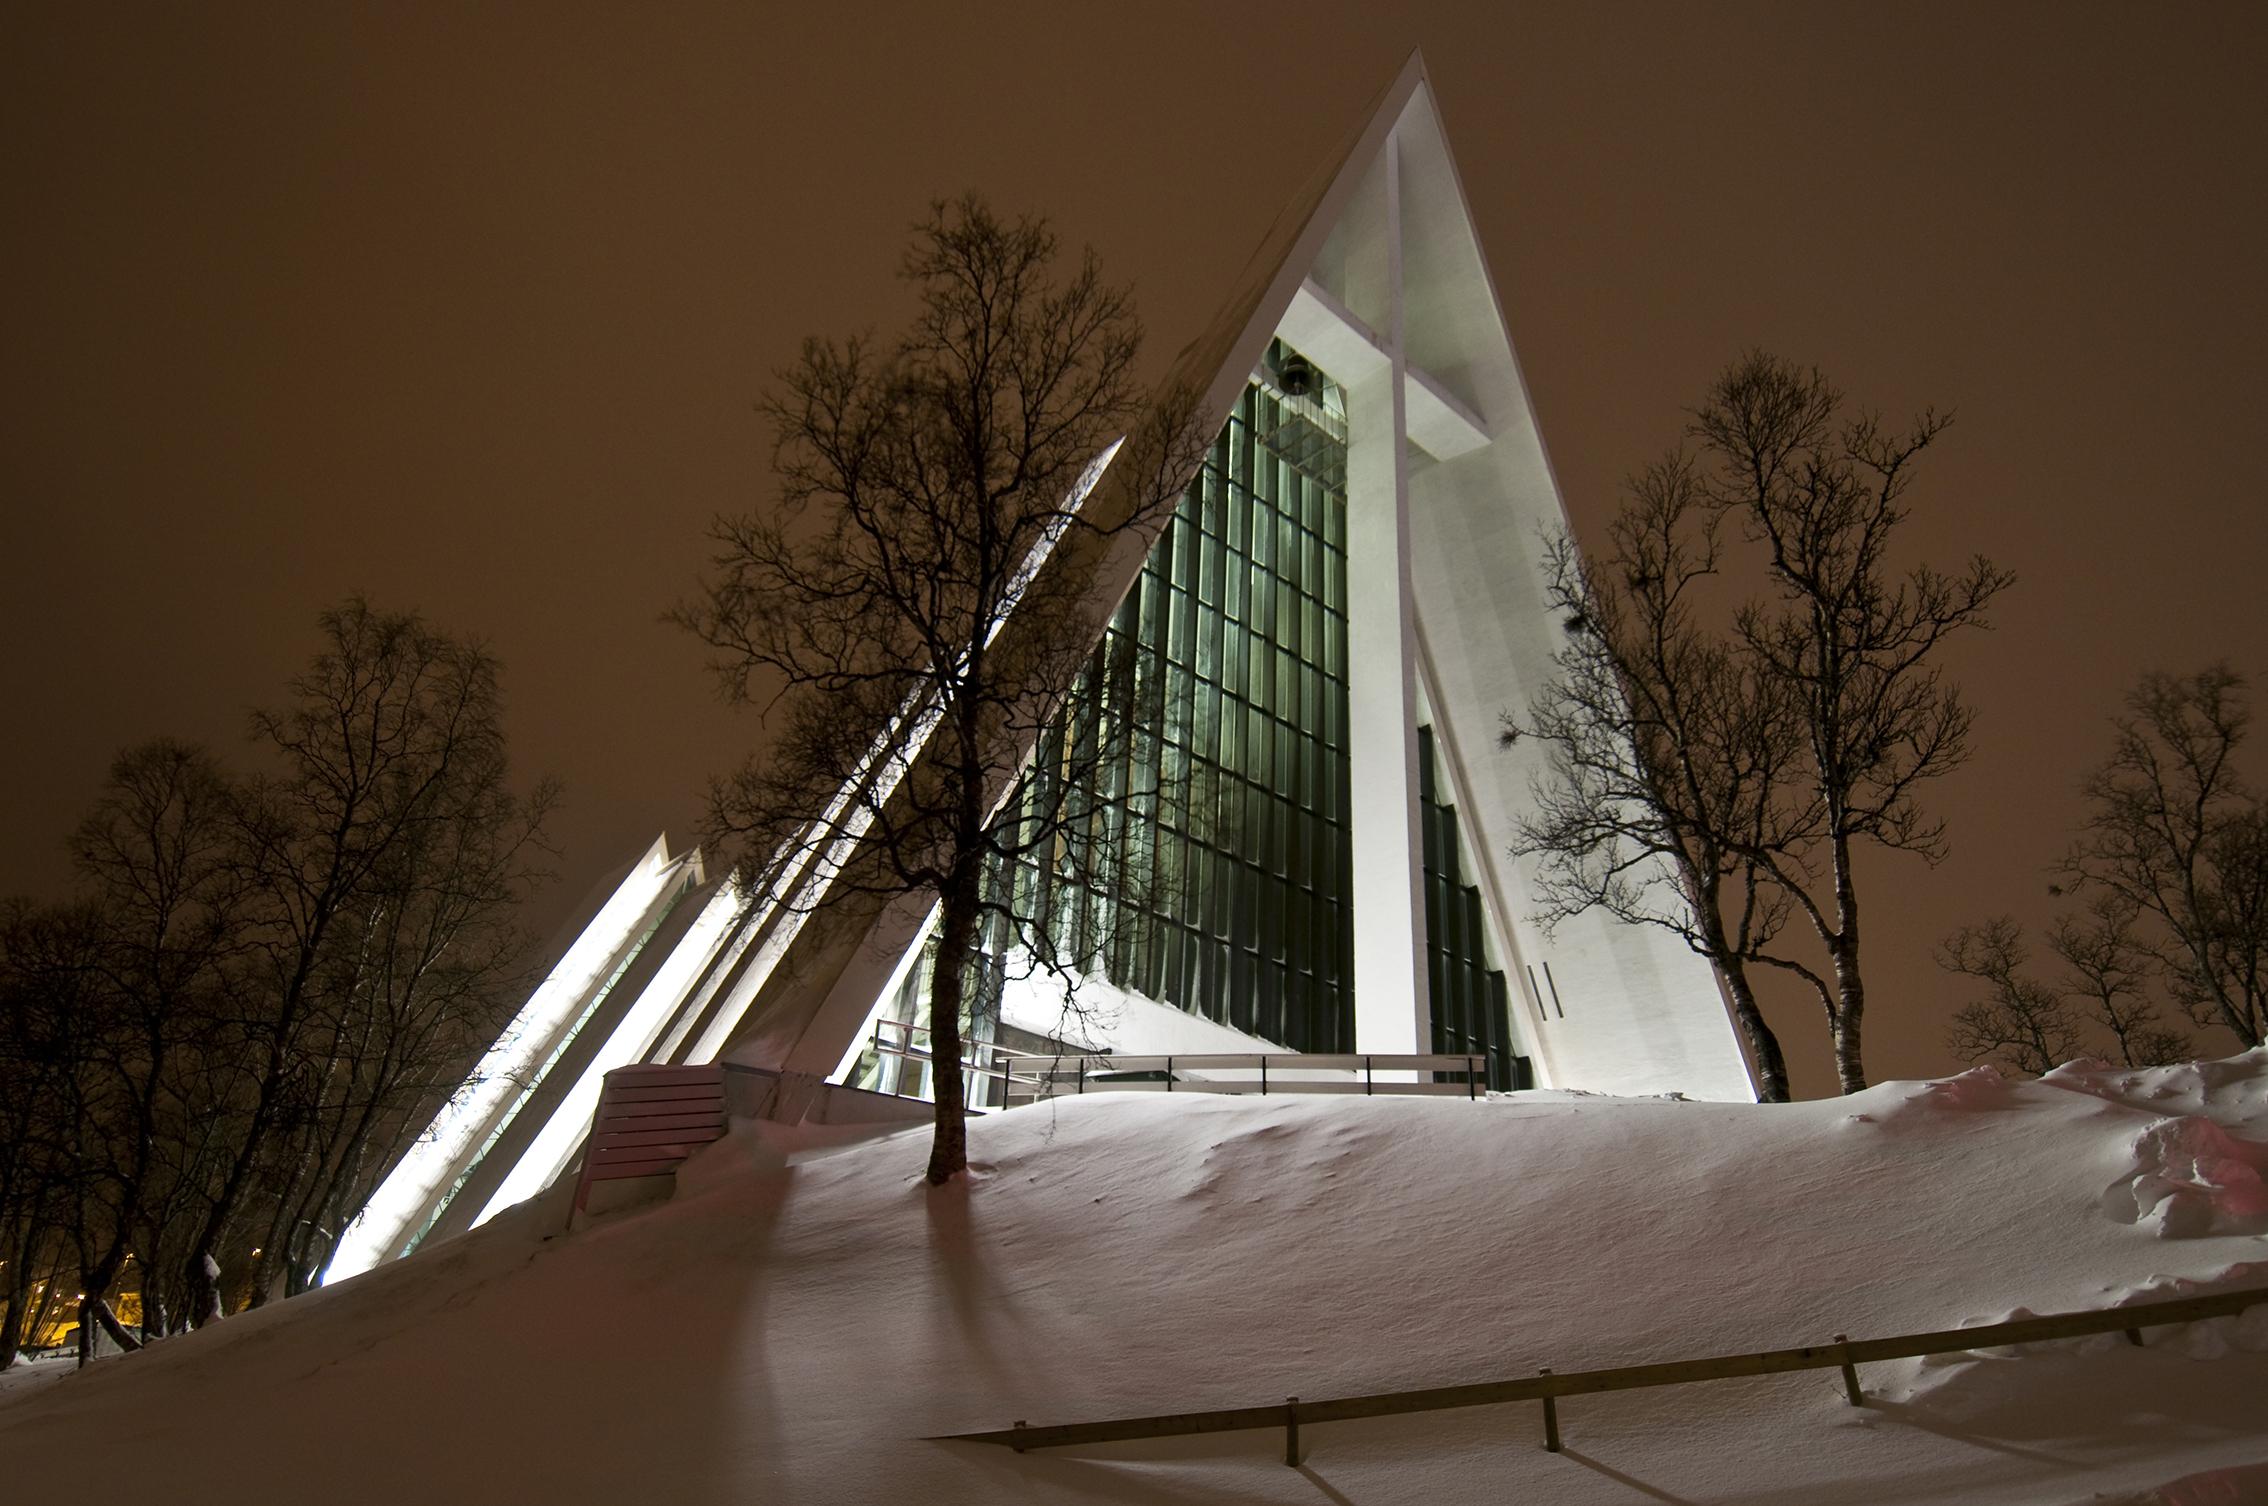 Arhitektura Tromsdalen_kirke_%28Ishavskatedralen%29_-_The_Arctic_Cathedral_%285557802765%29